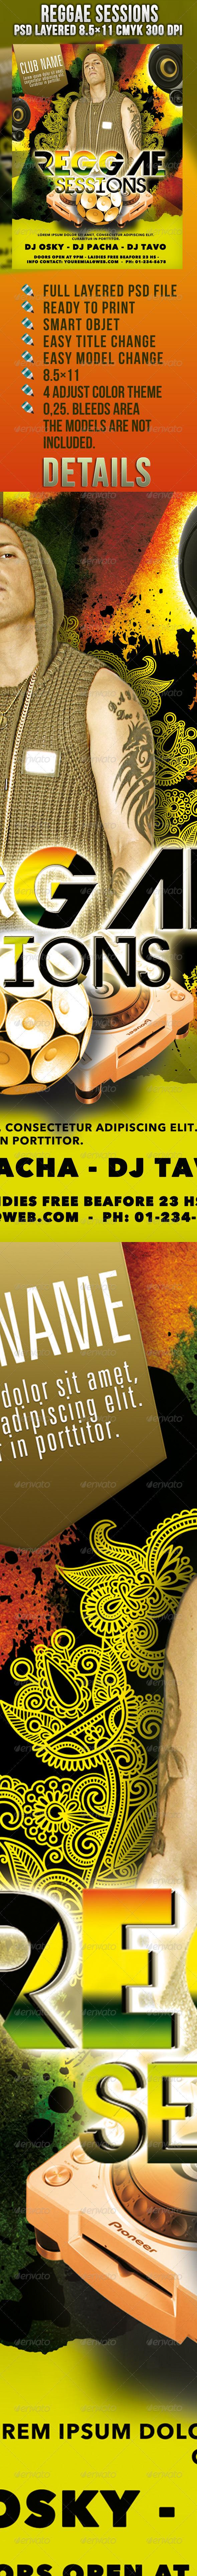 GraphicRiver Reggae Sessions 1215626